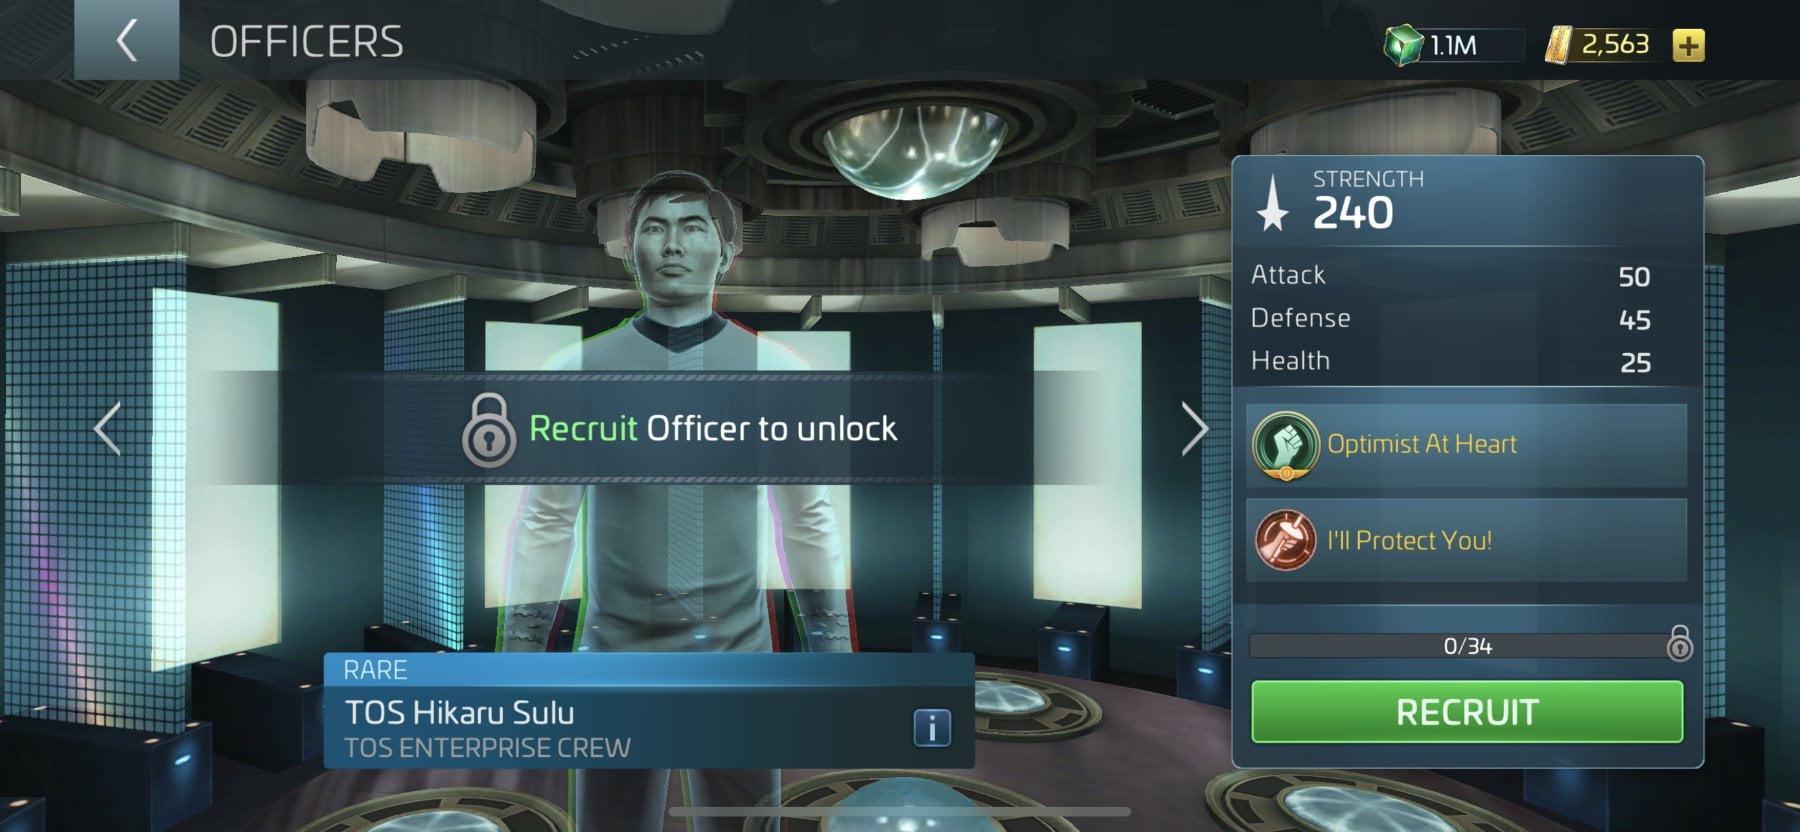 Star Trek Fleet Command Officer TOS Hikaru Sulu